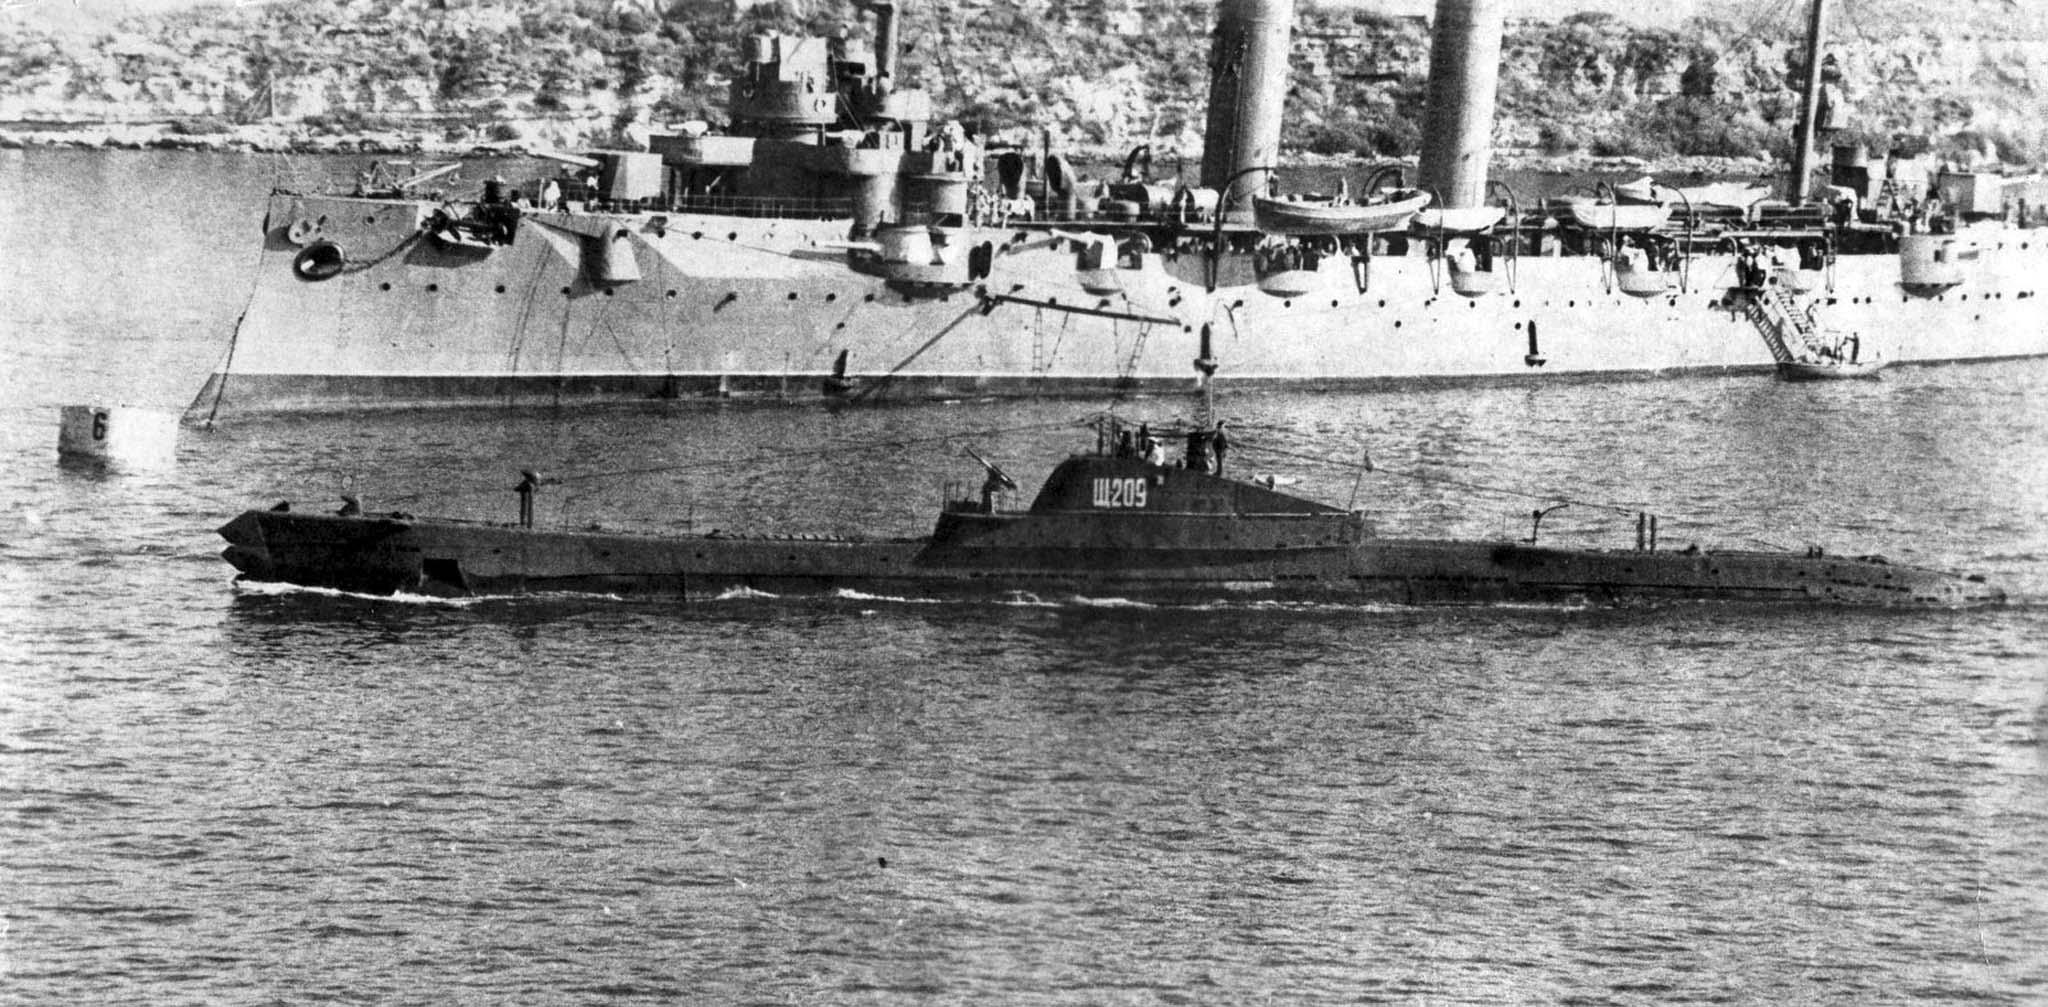 Shch-209, cruiser Comintern